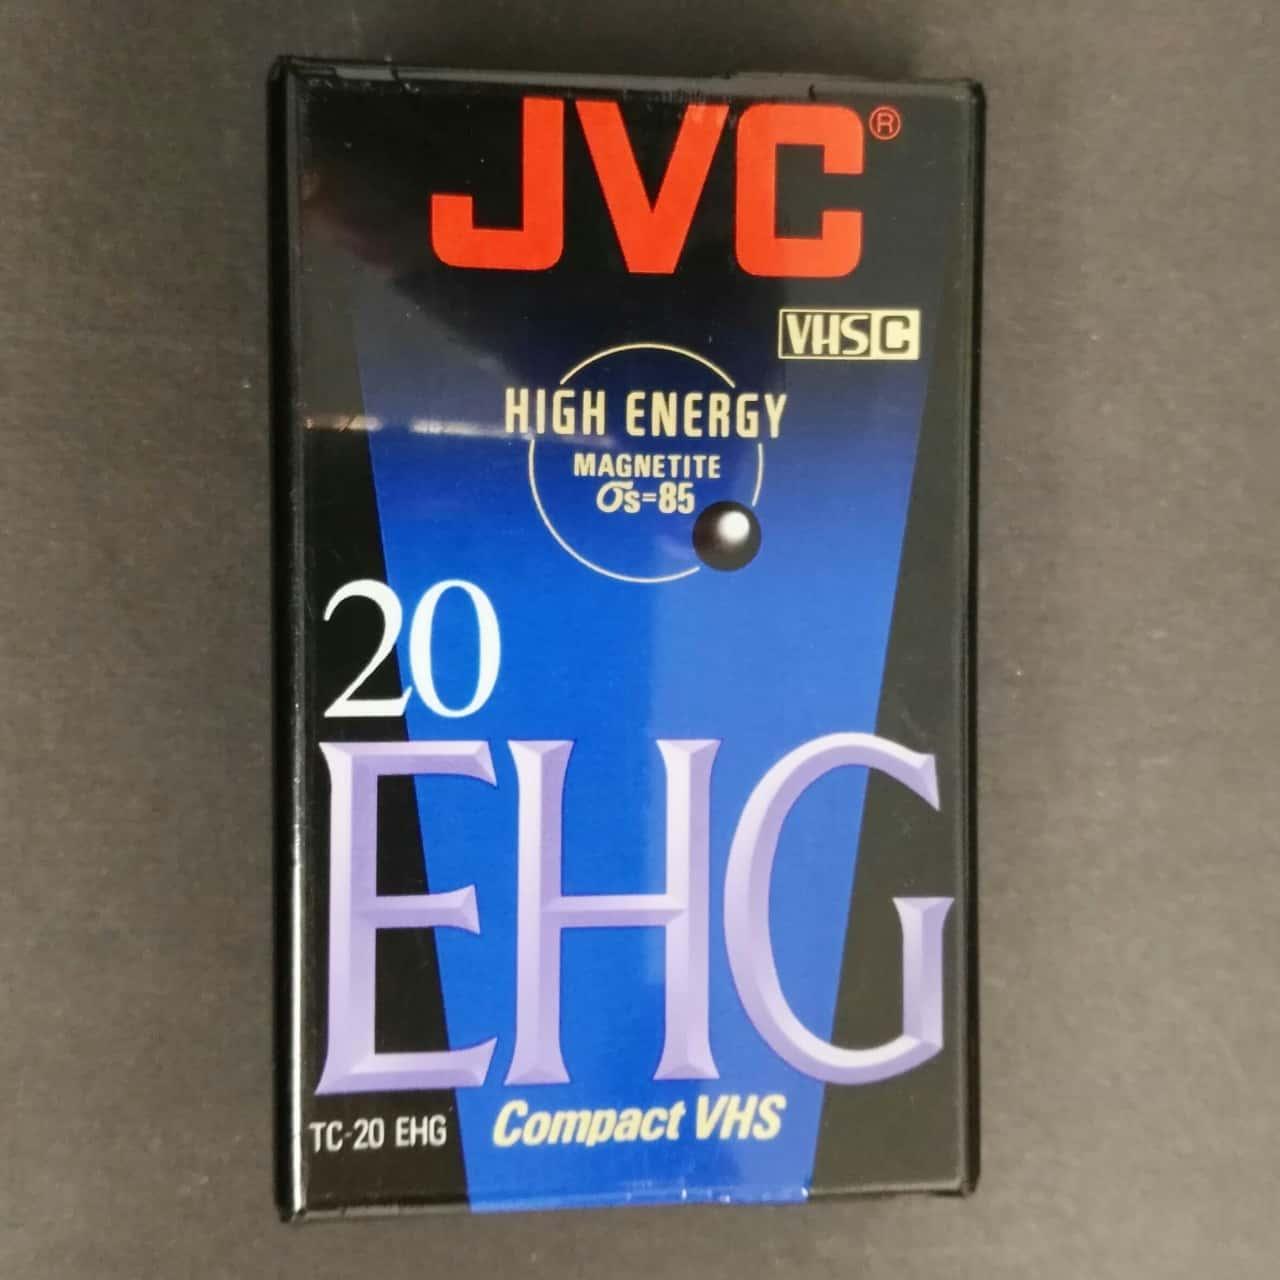 JVC VHS-C EHG 20 Video Tape - New - Compact VHS